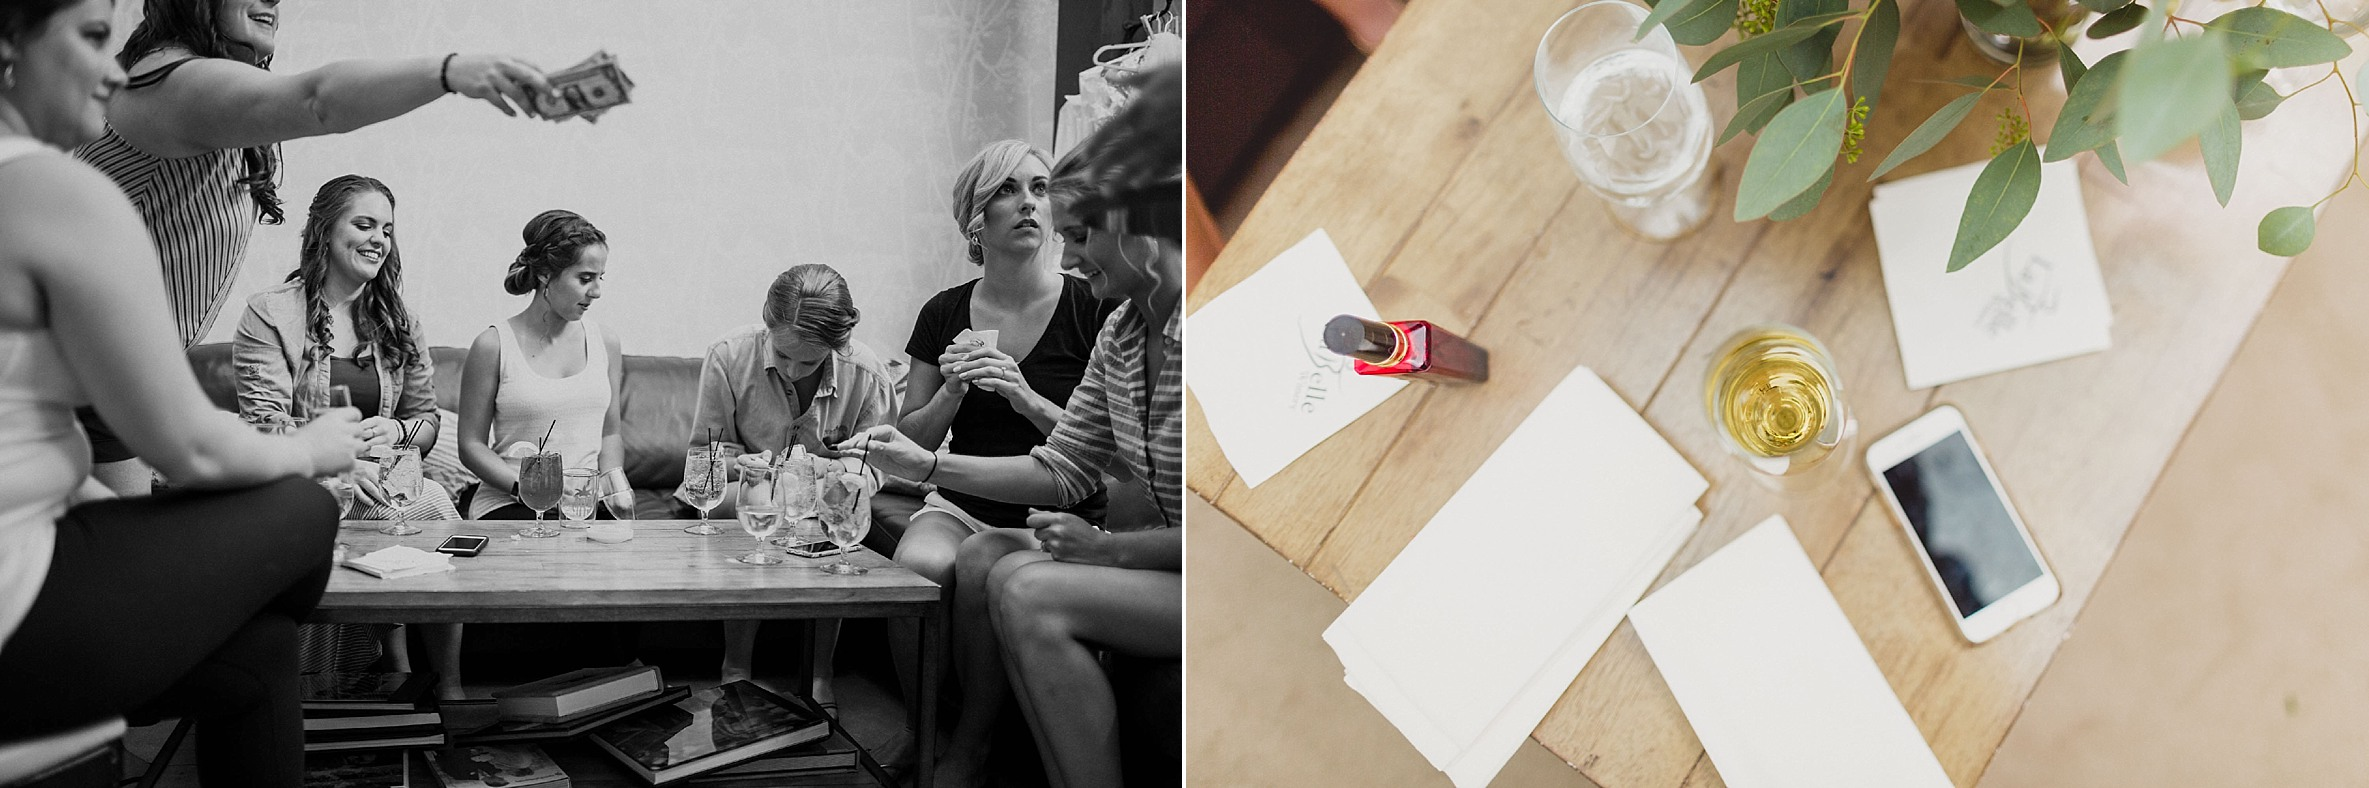 labelle winery wedding-1.jpg